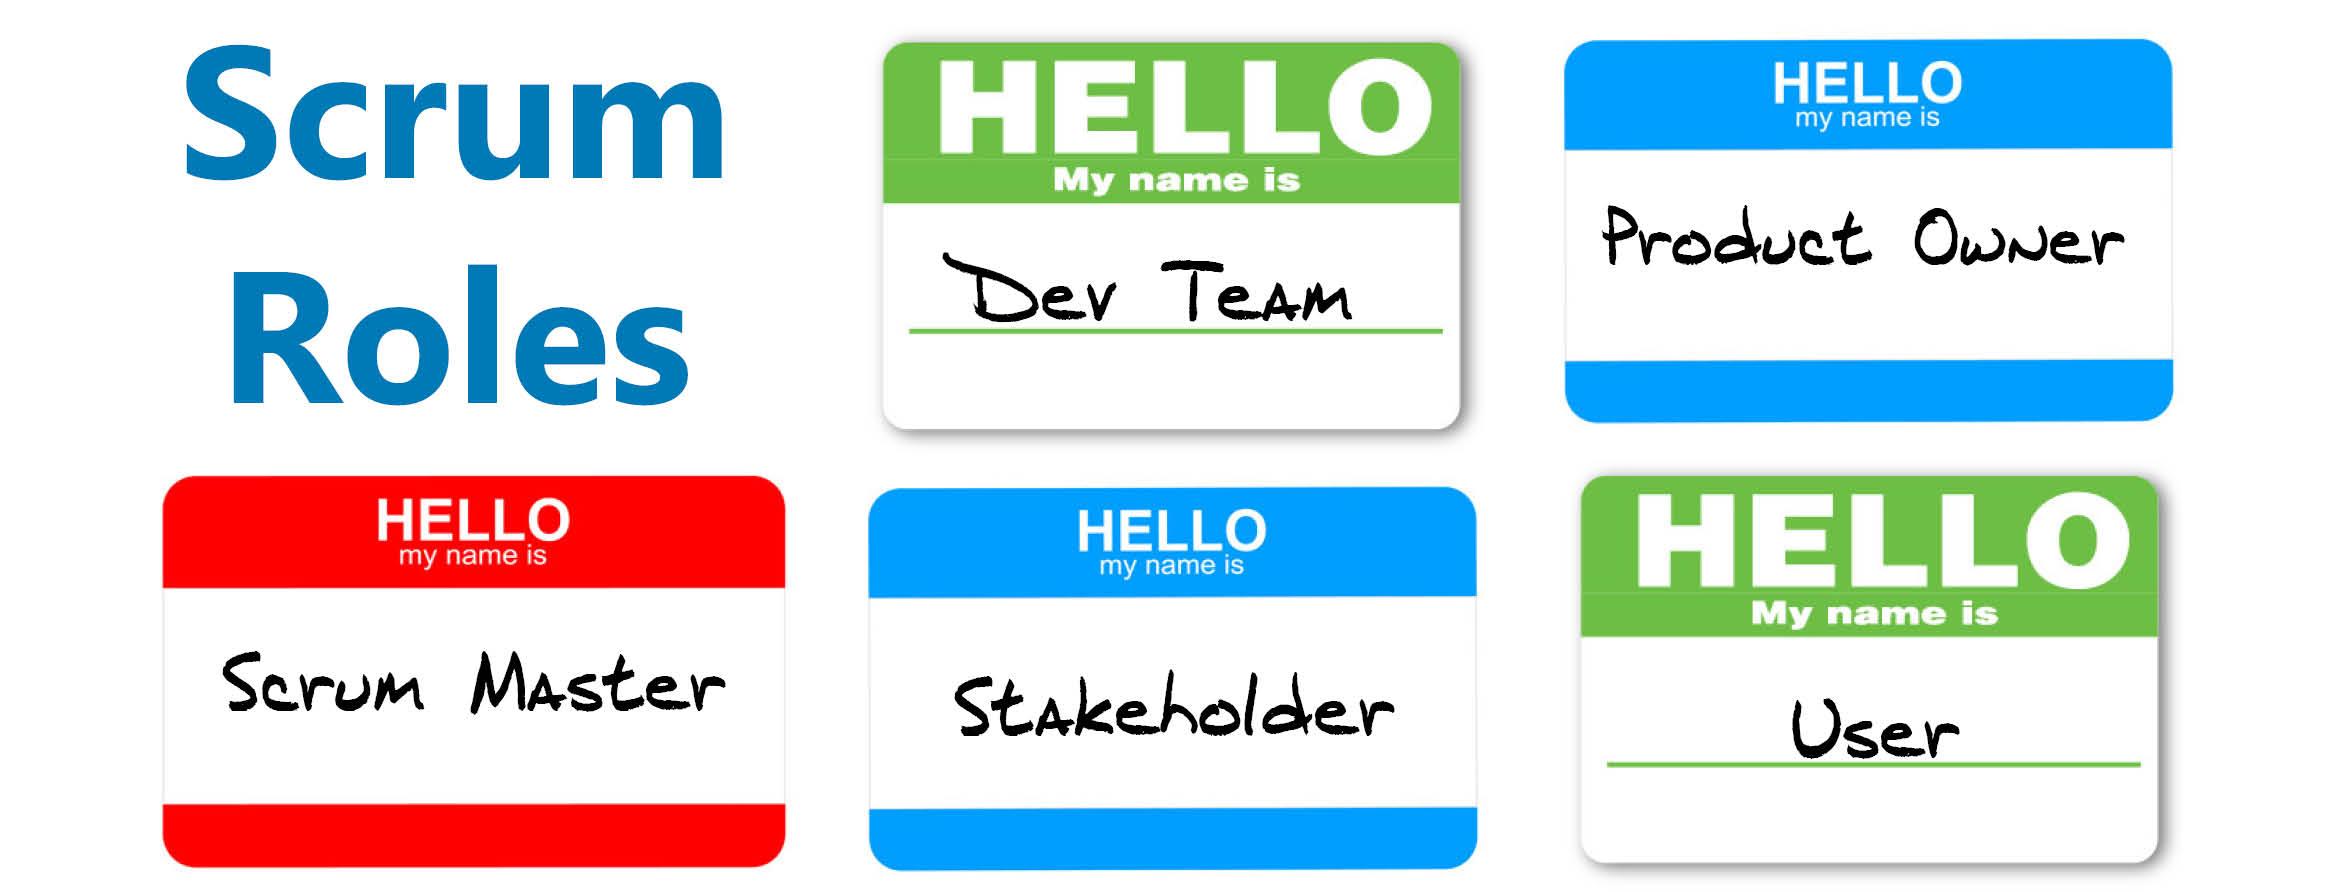 agile web development with rails 5 pdf